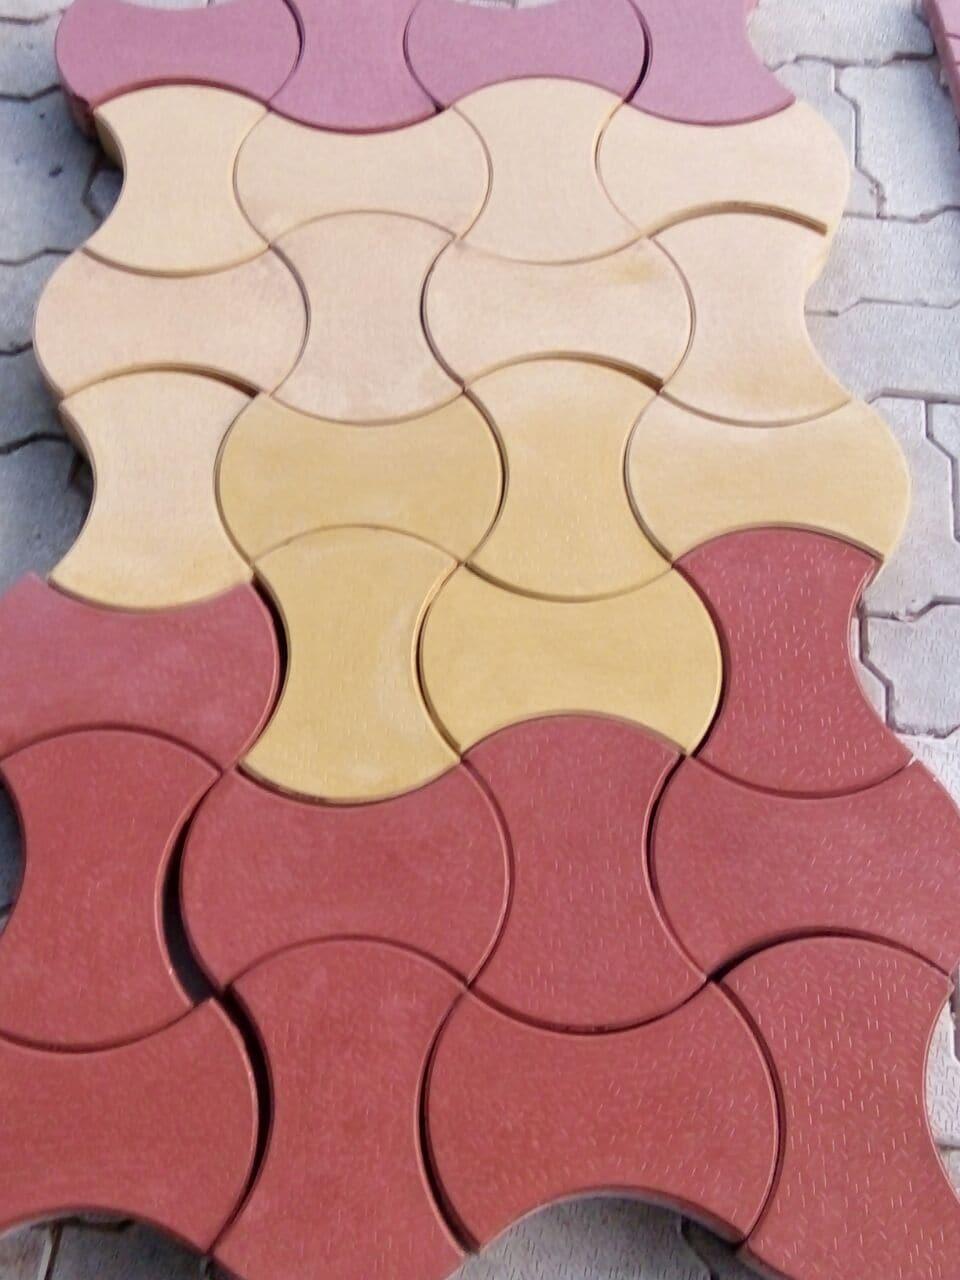 Top 30 Kerb Stone Manufacturers in Kolkata - Best Block Paving